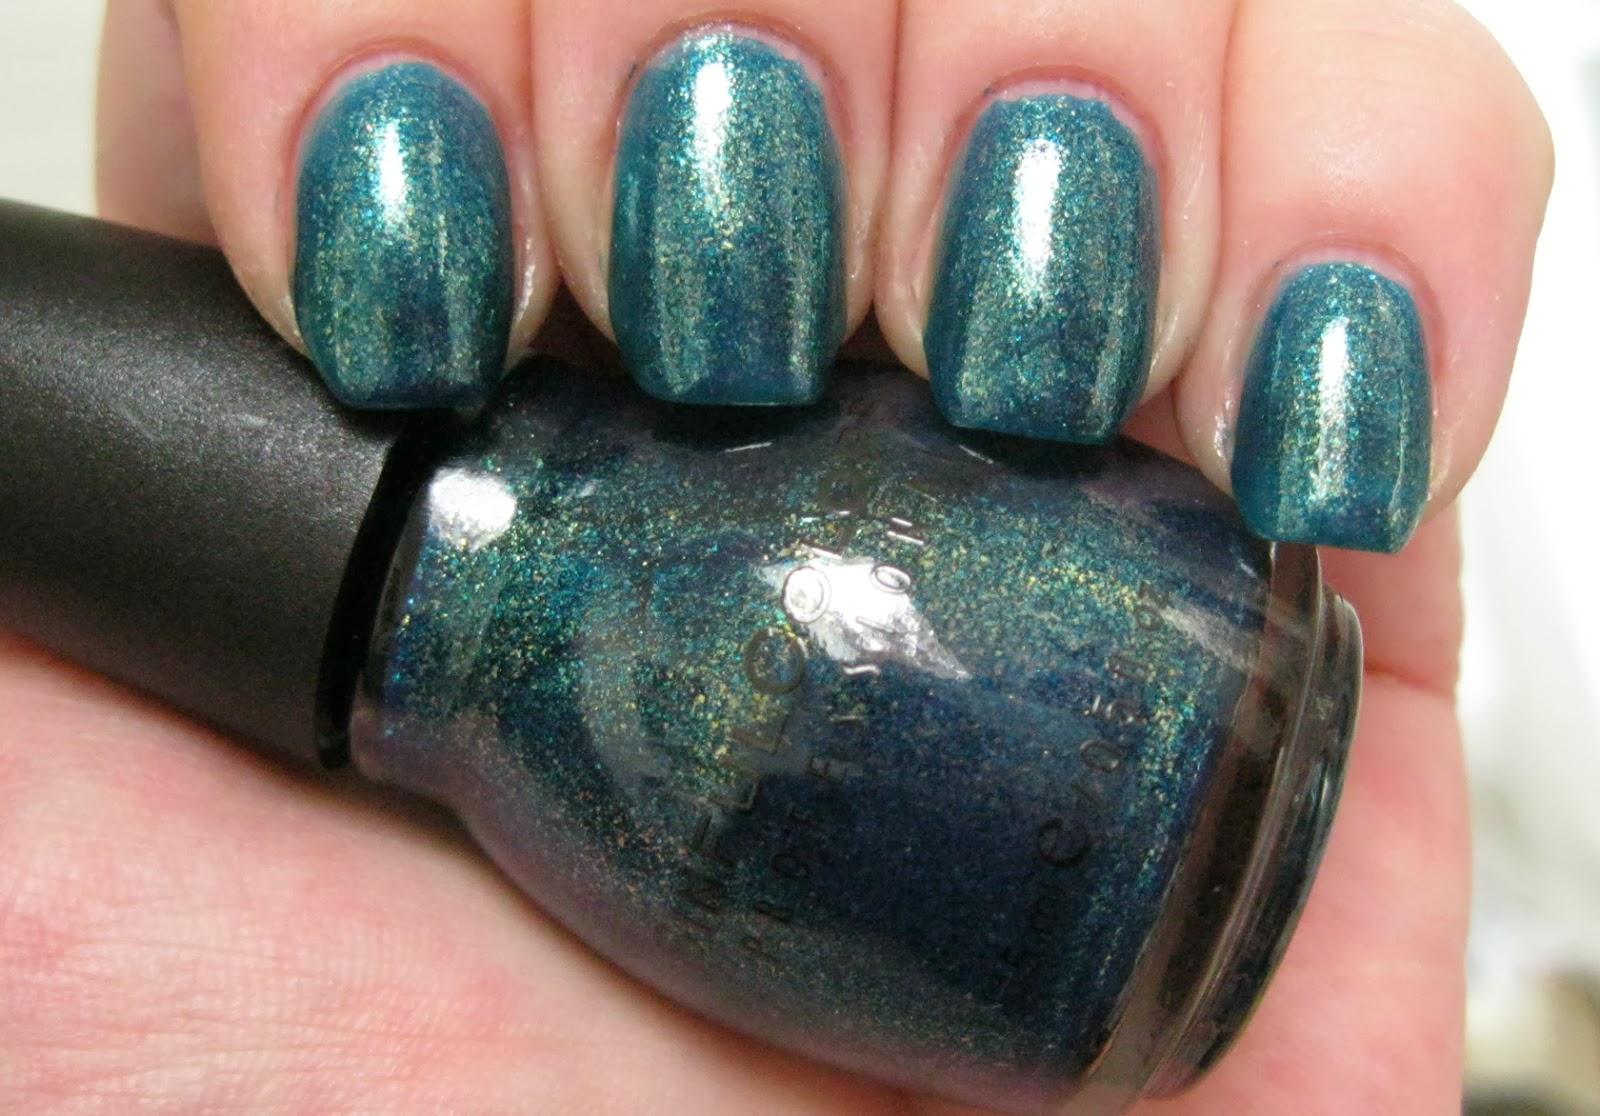 Mermaid Nail Designs